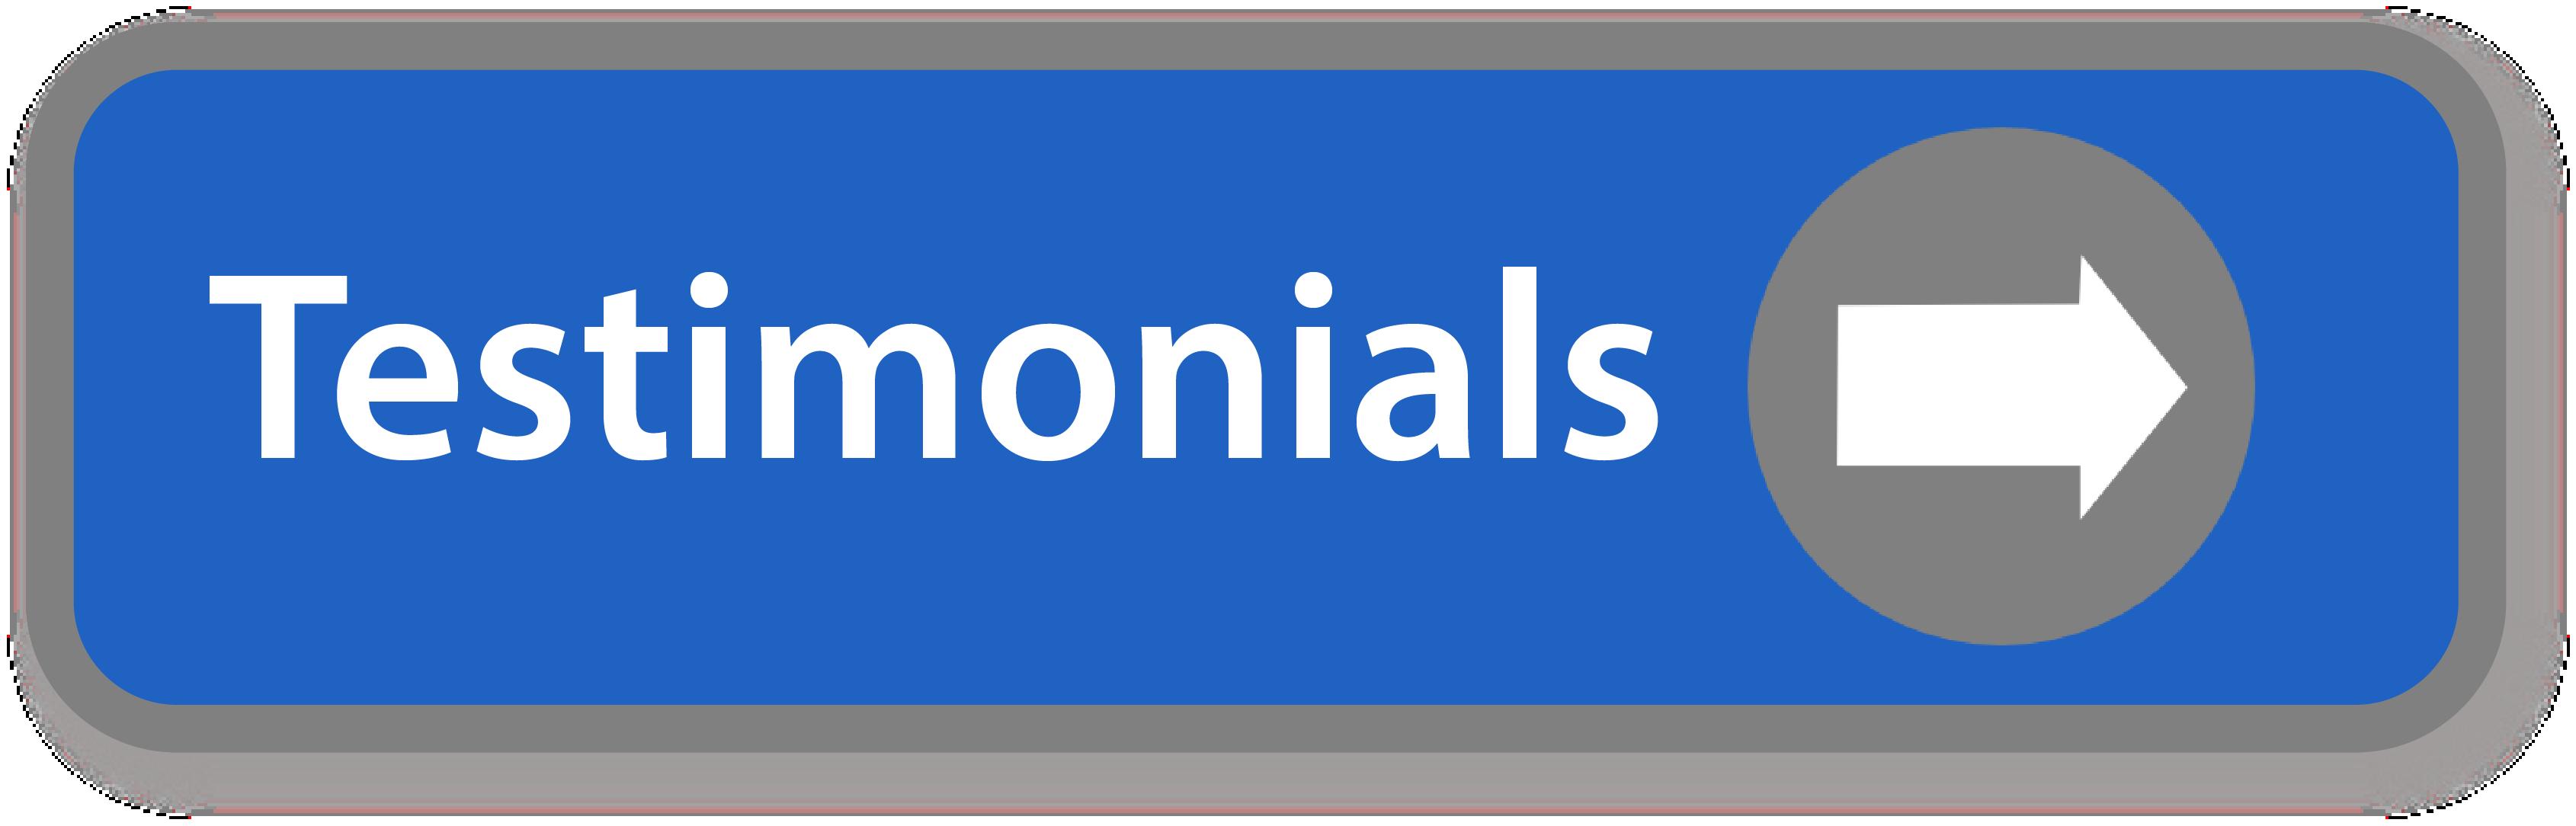 testimonial-buttonnew.png